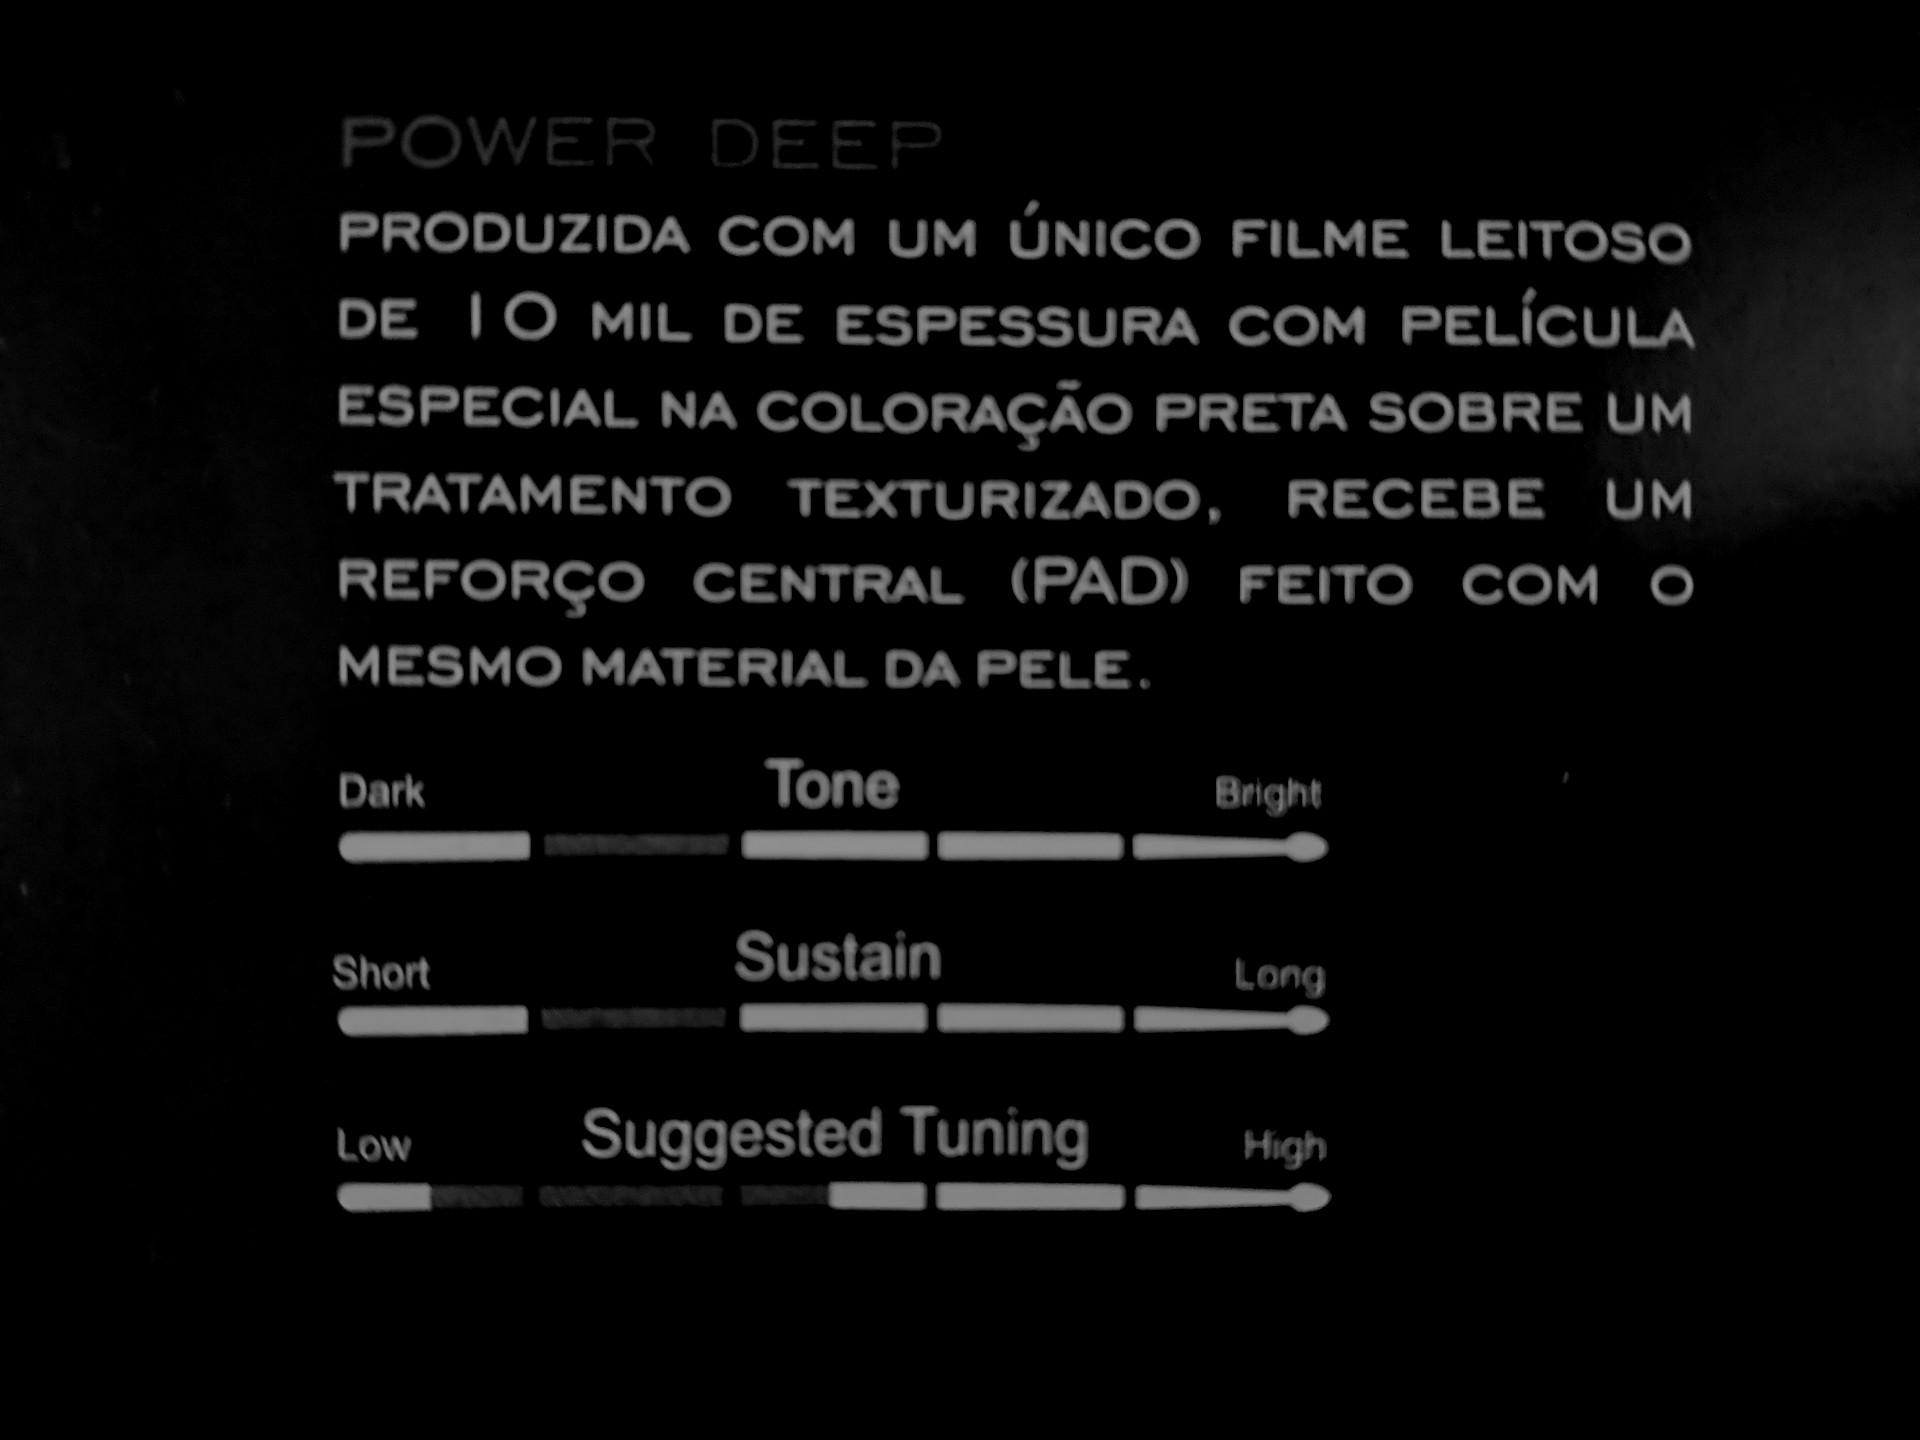 "Pele texturizada POWER DEEP C/ PAD 16"" Dudu Portes, LUEN."